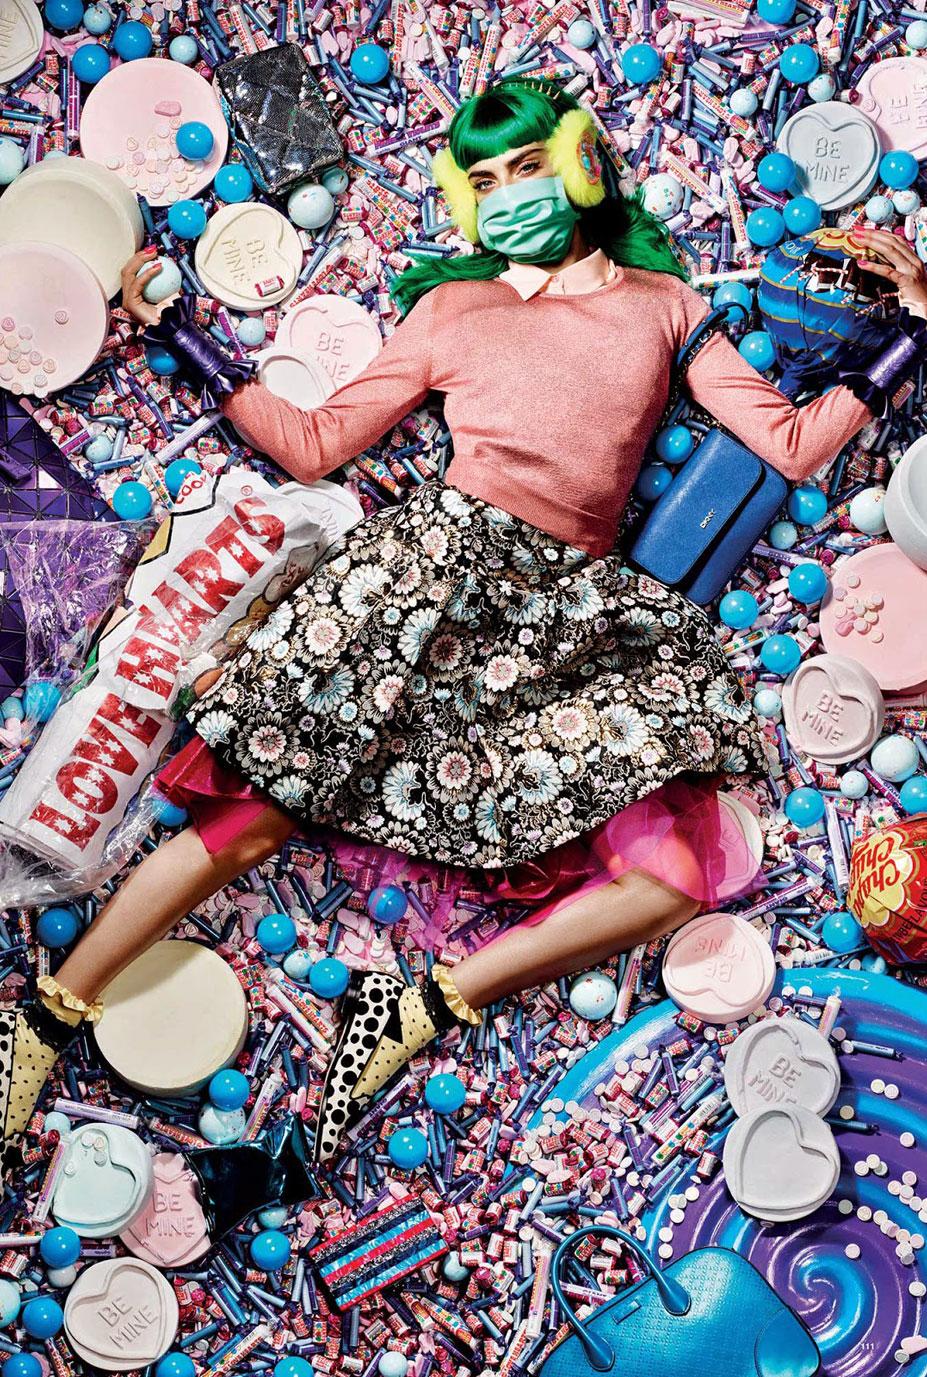 -конфетка- Кара Делавинь / Cara Delevingne by Liz Collins for Love-12 FW-2014